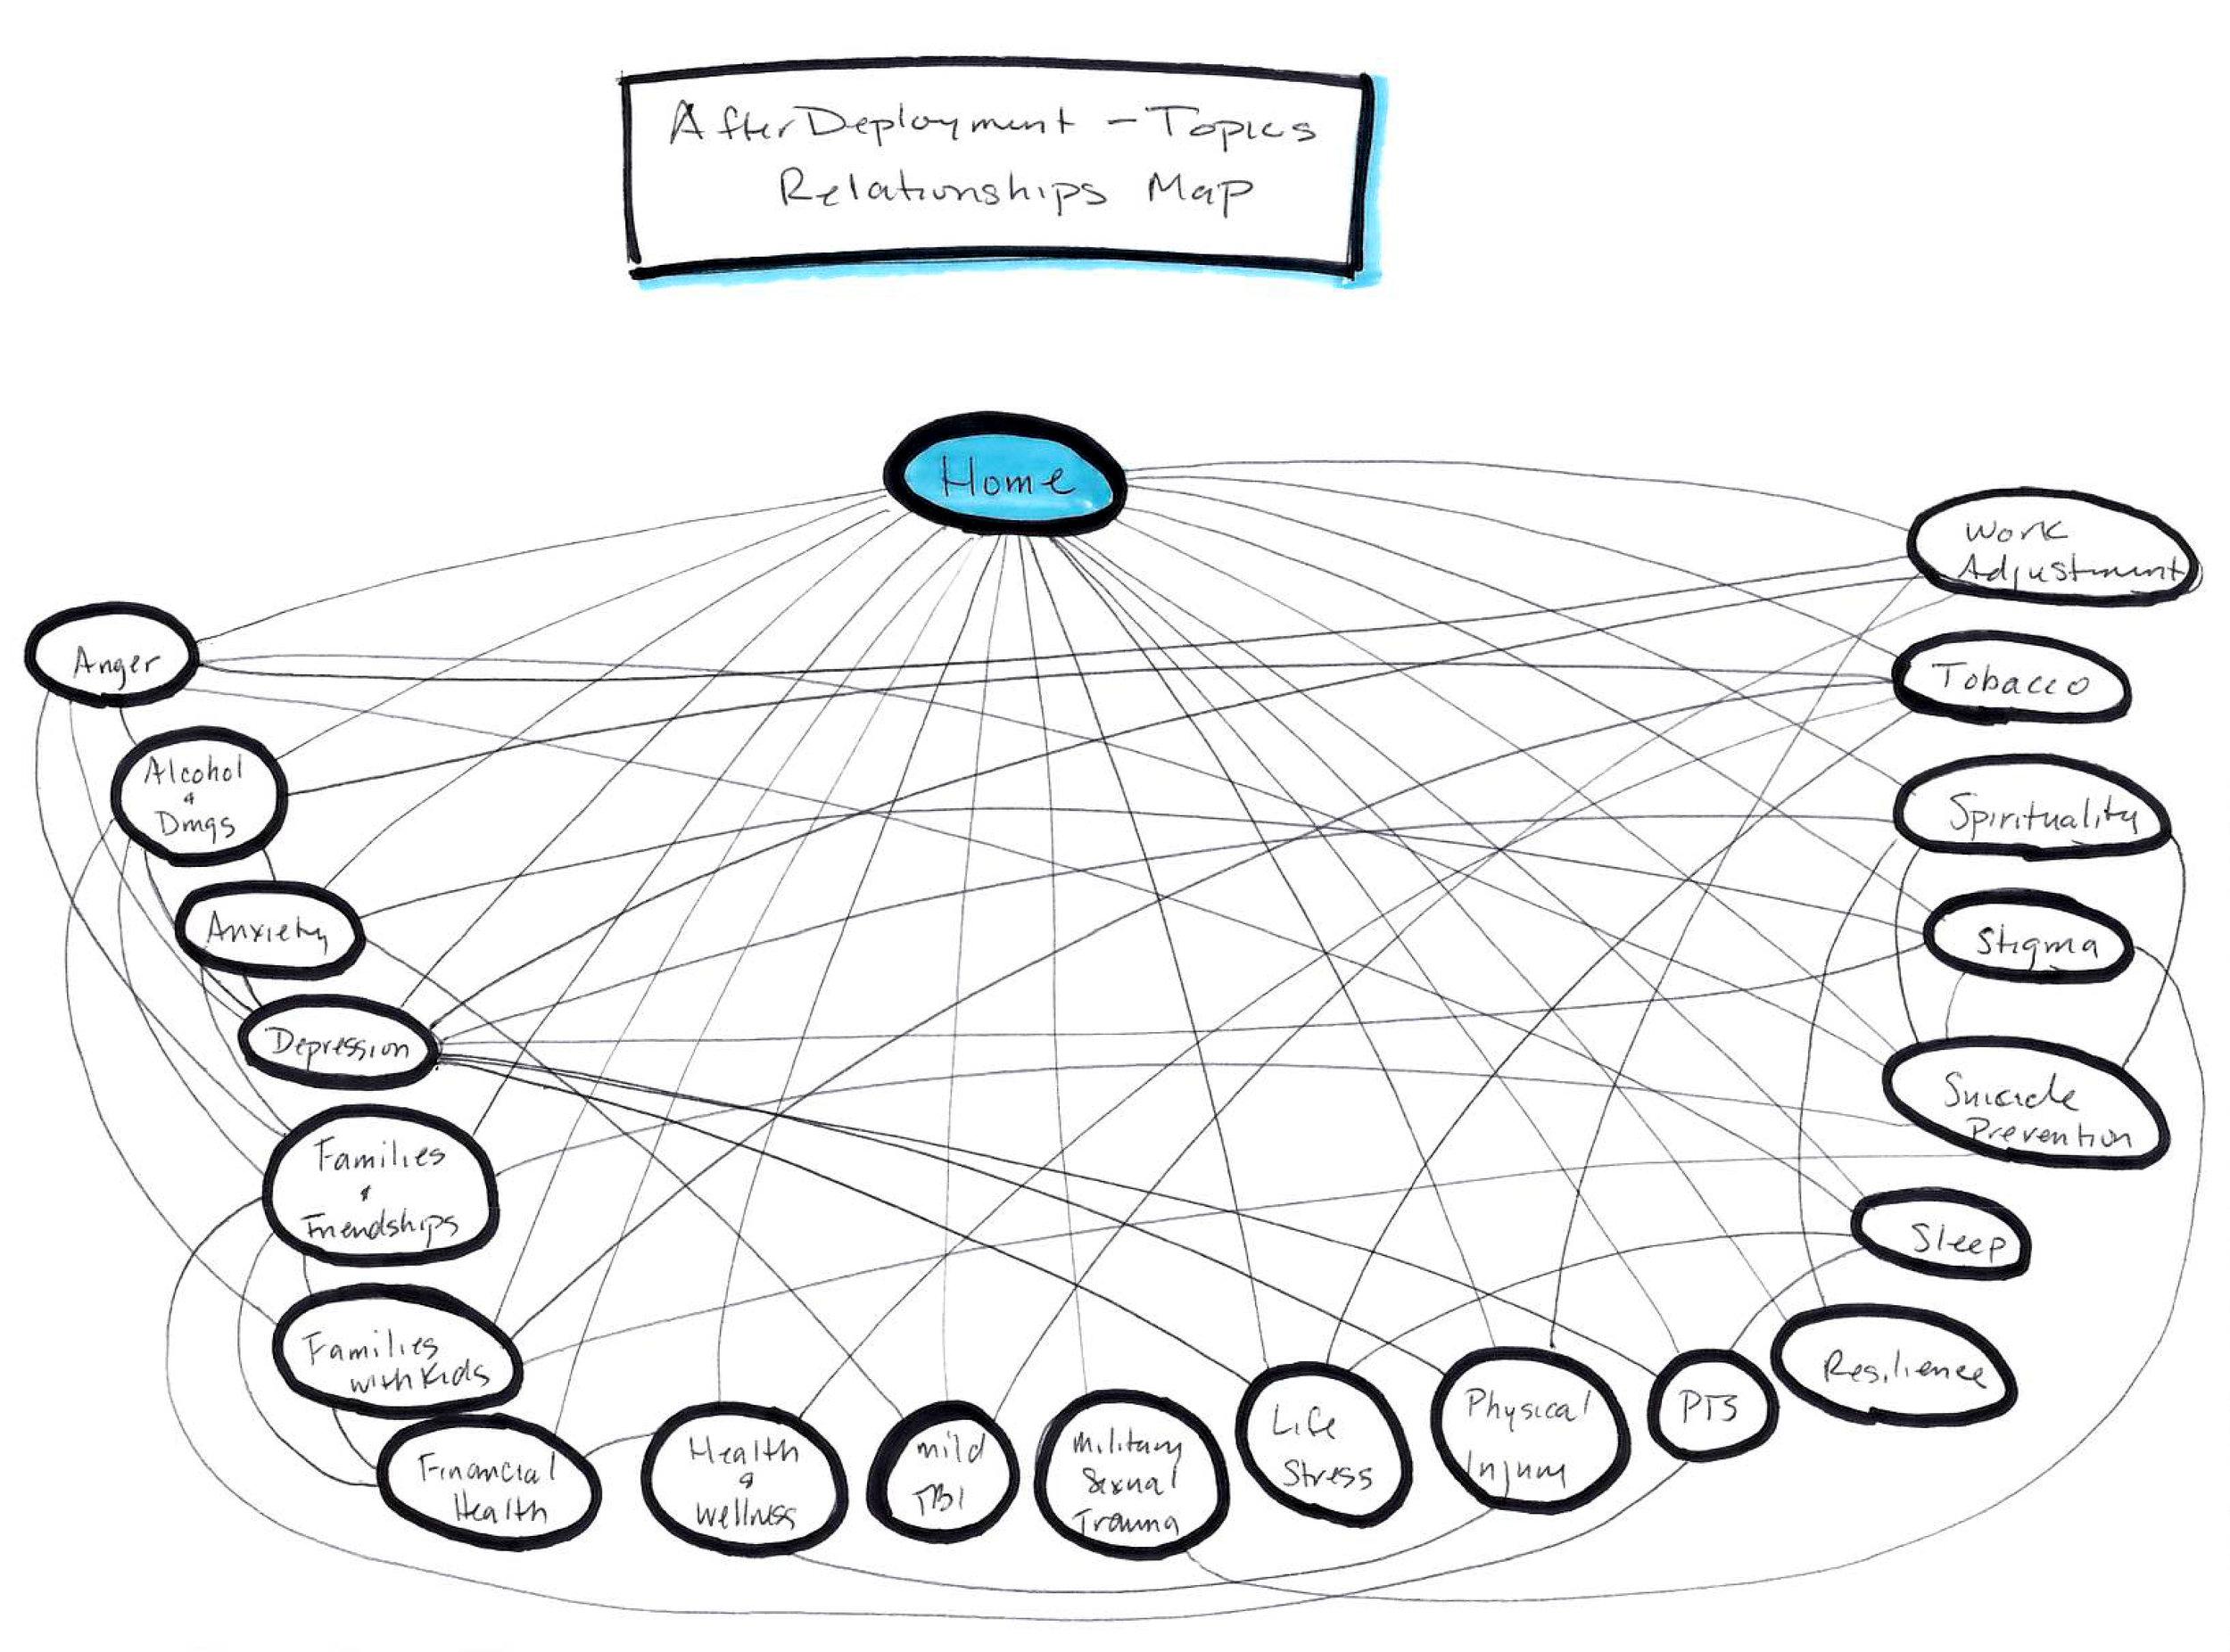 AD_Sketches_topics_mindmap.jpg